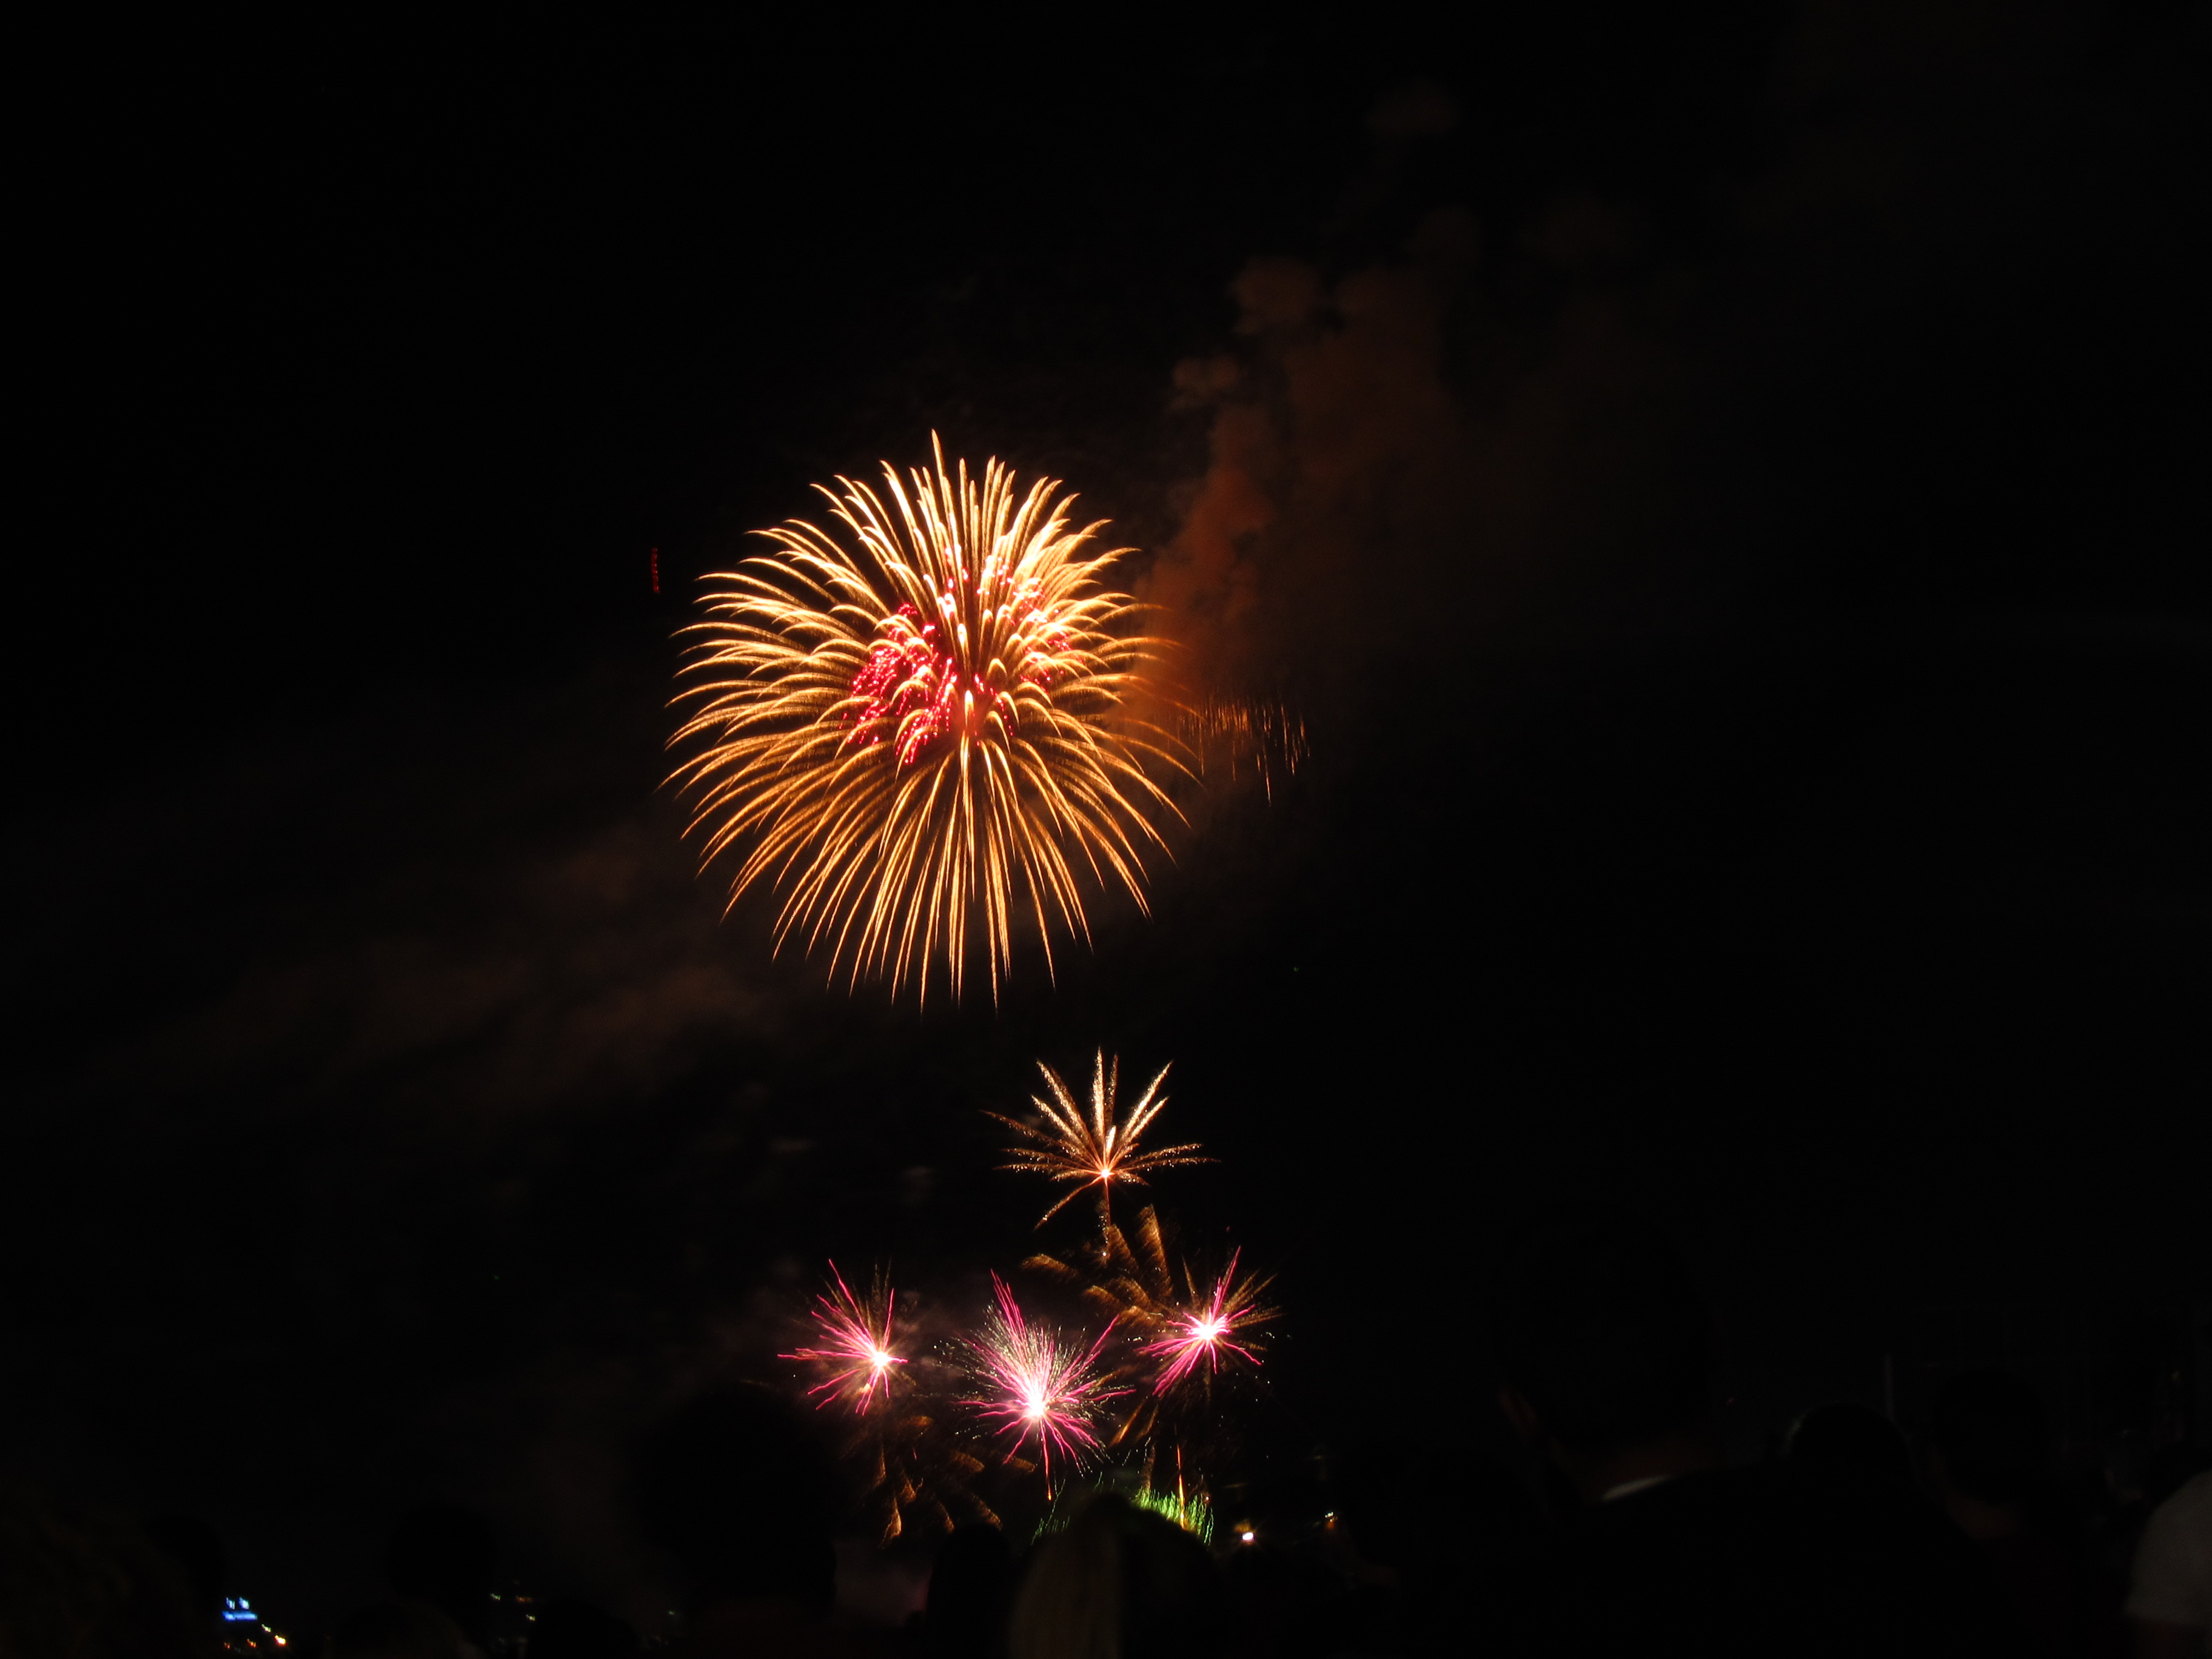 Night Sky Fireworks, Effects, Fireworks, Lights, Night, HQ Photo